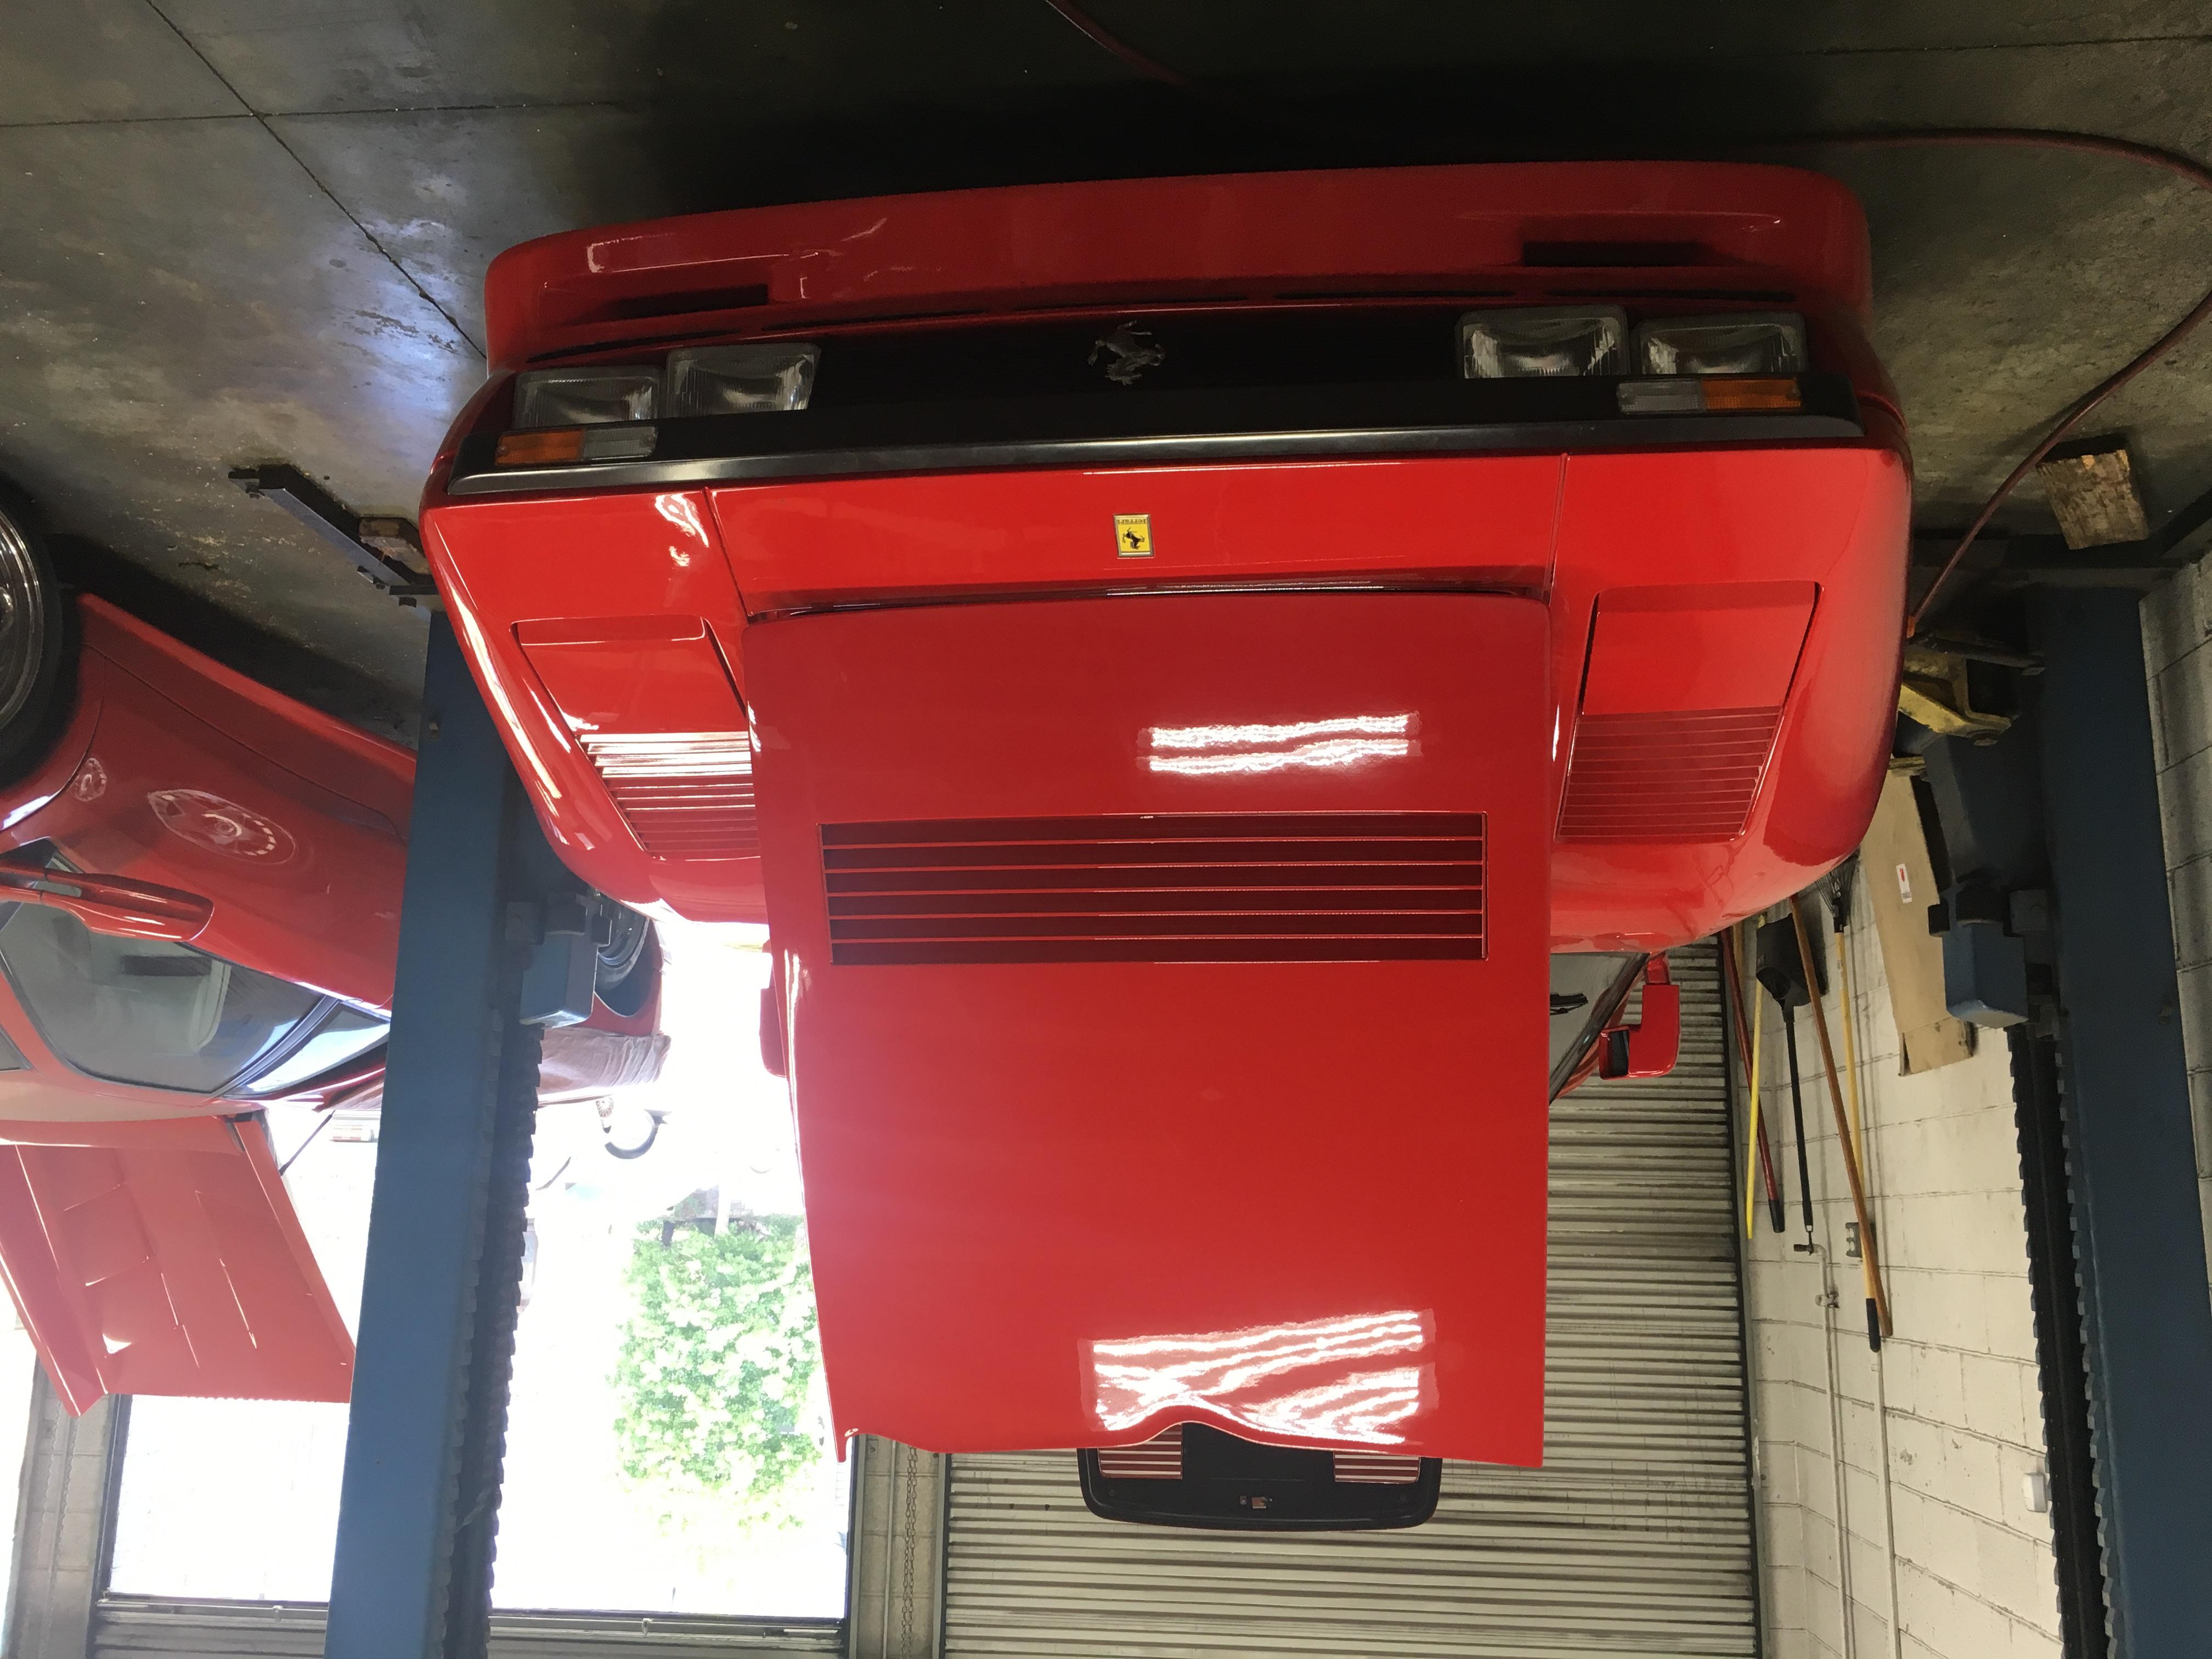 dirtyoldcars.com 1985 Ferrari 288 GTO: Only 700 KM 20